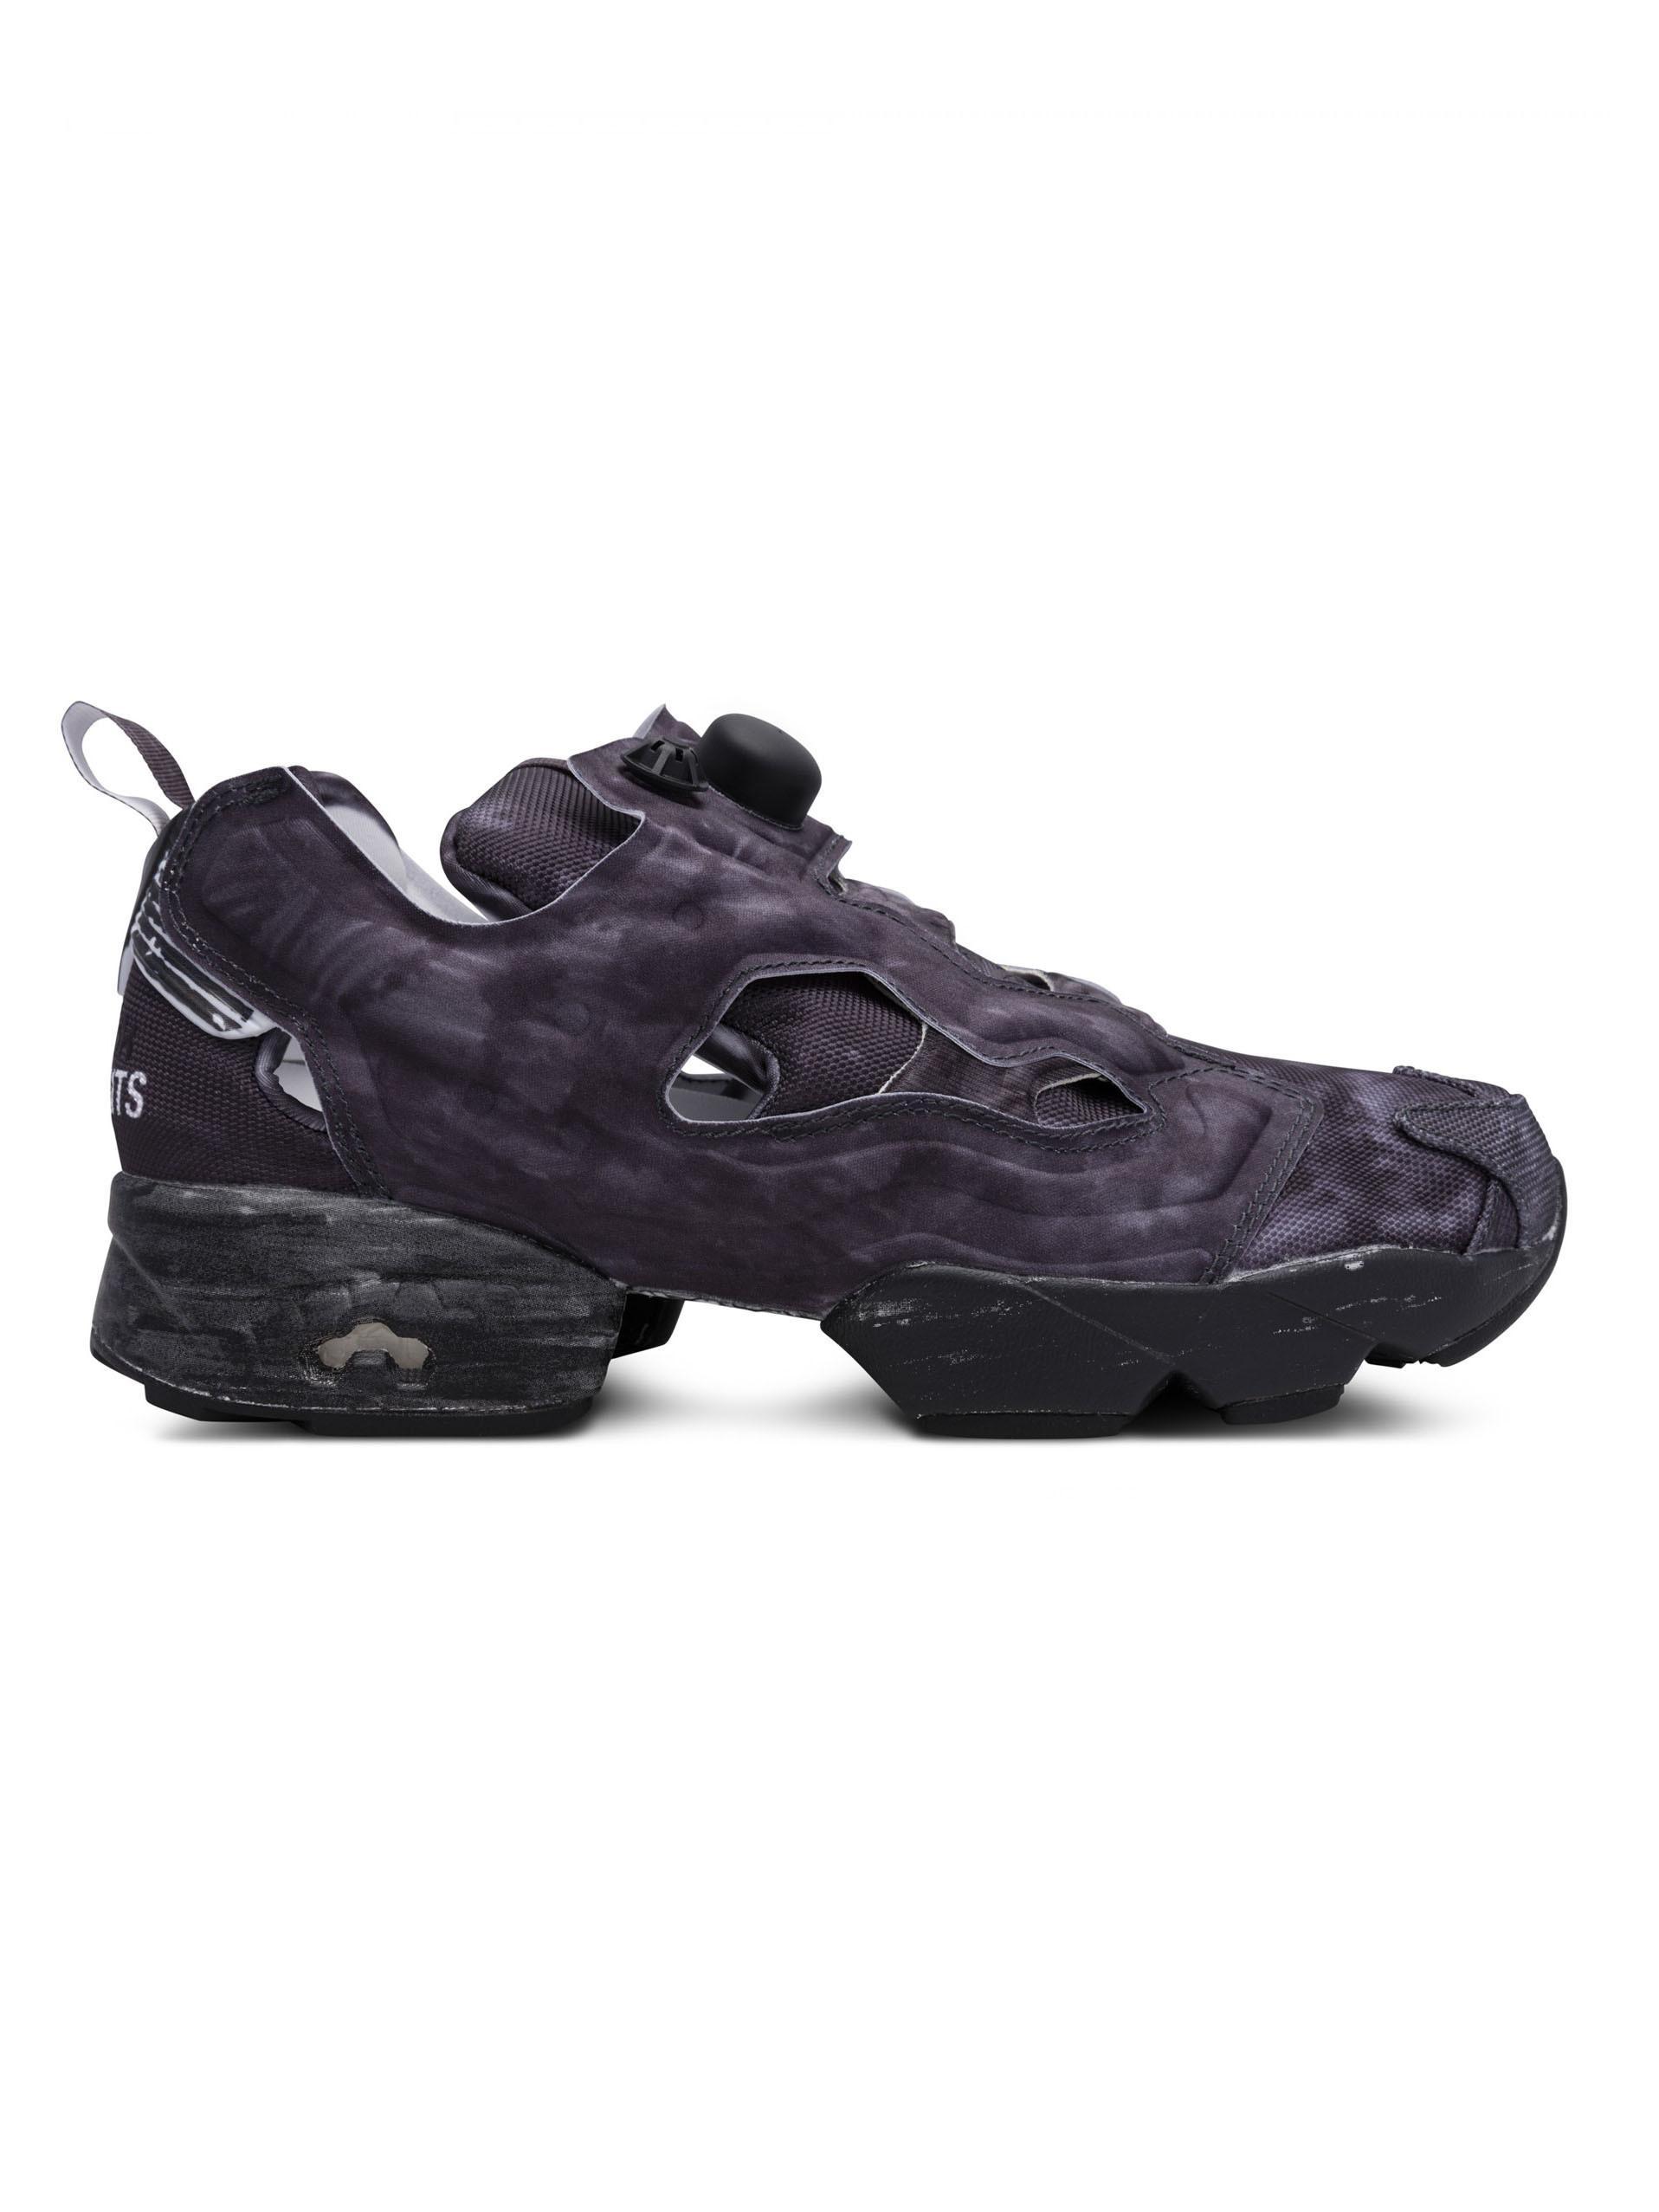 de5abb480a77 Lyst - Vetements X Reebok Highlighted Pump Sneakers in Black for Men ...